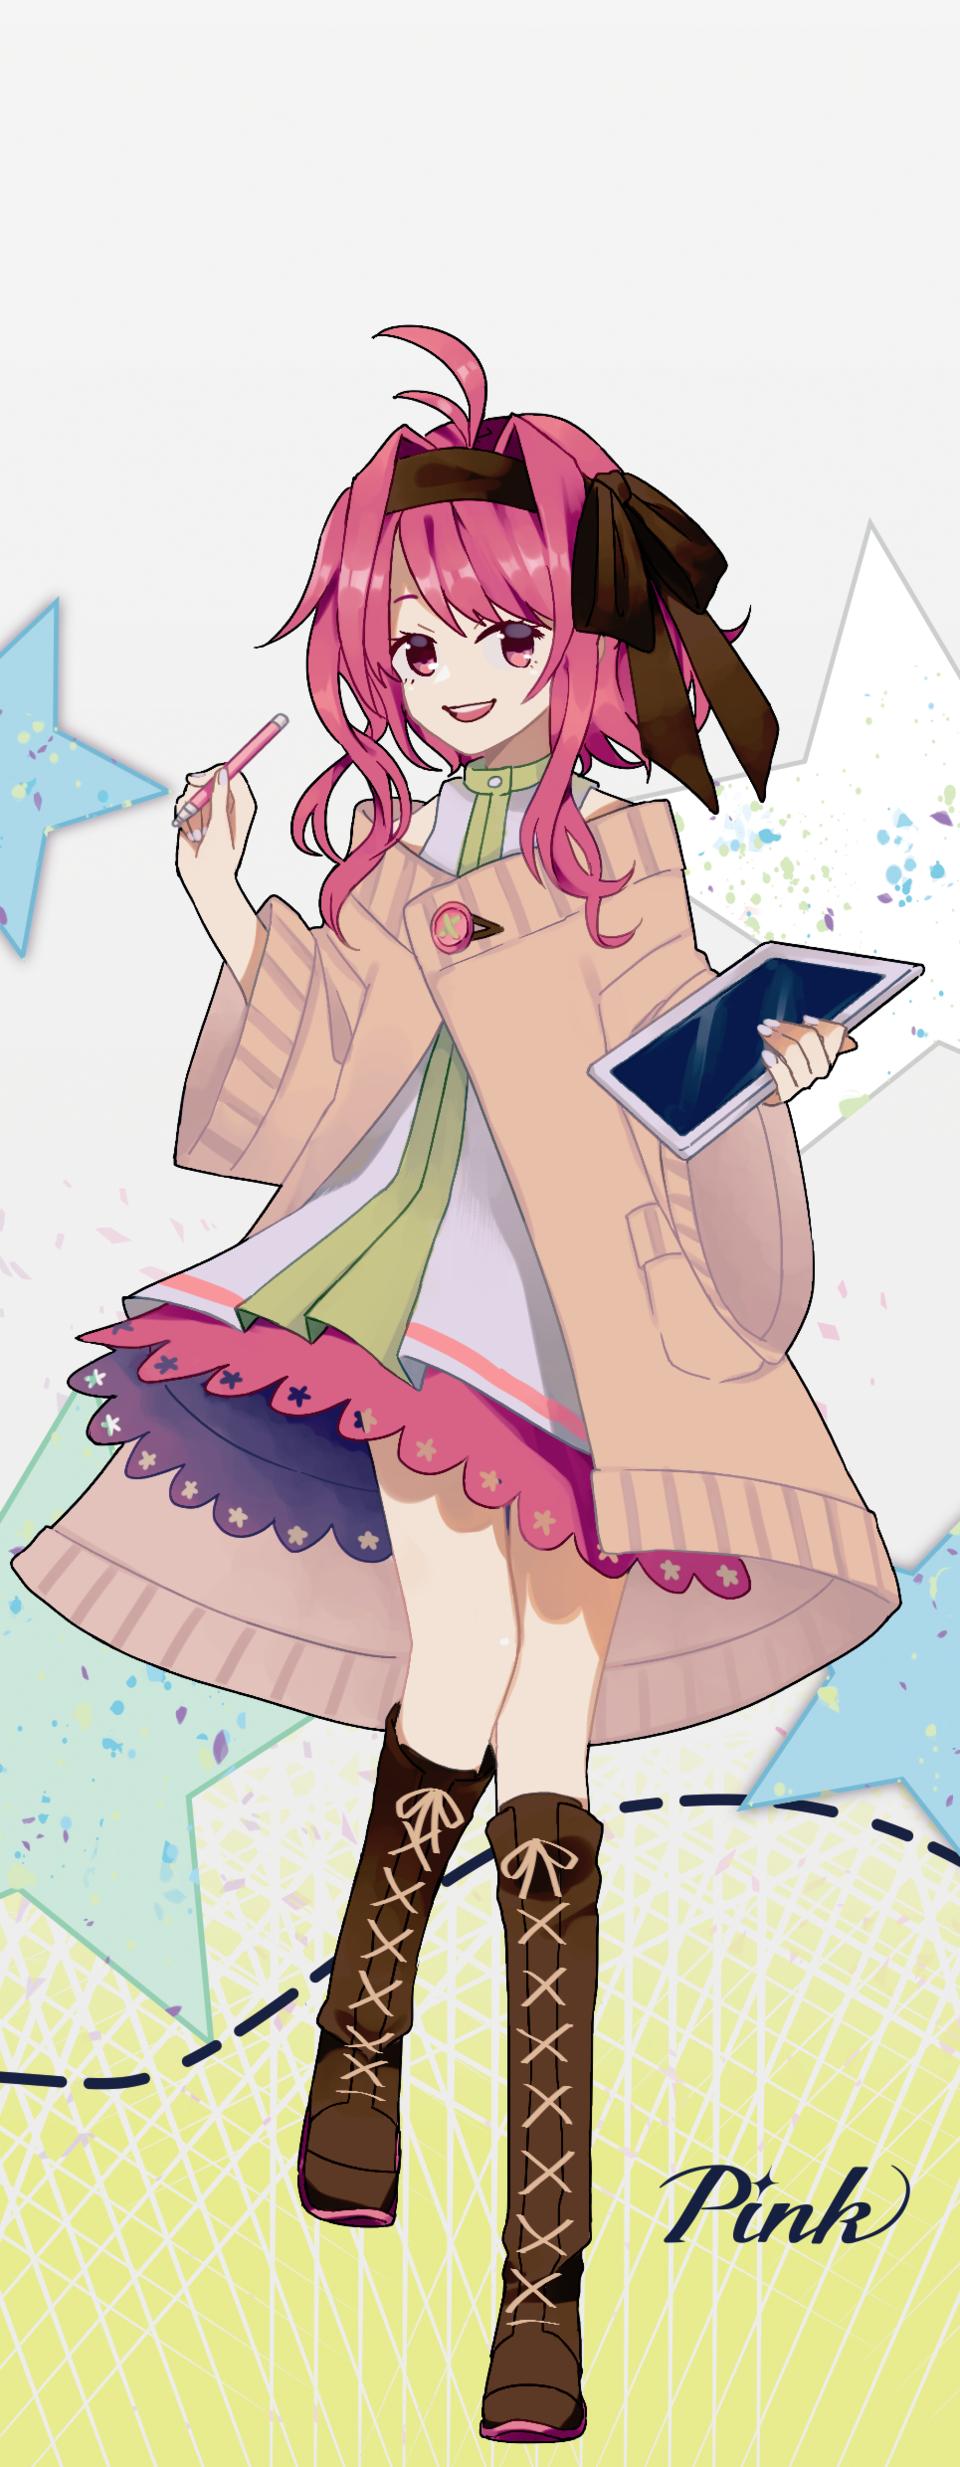 Pink Illust of あわべに PASTEL_SKETCH